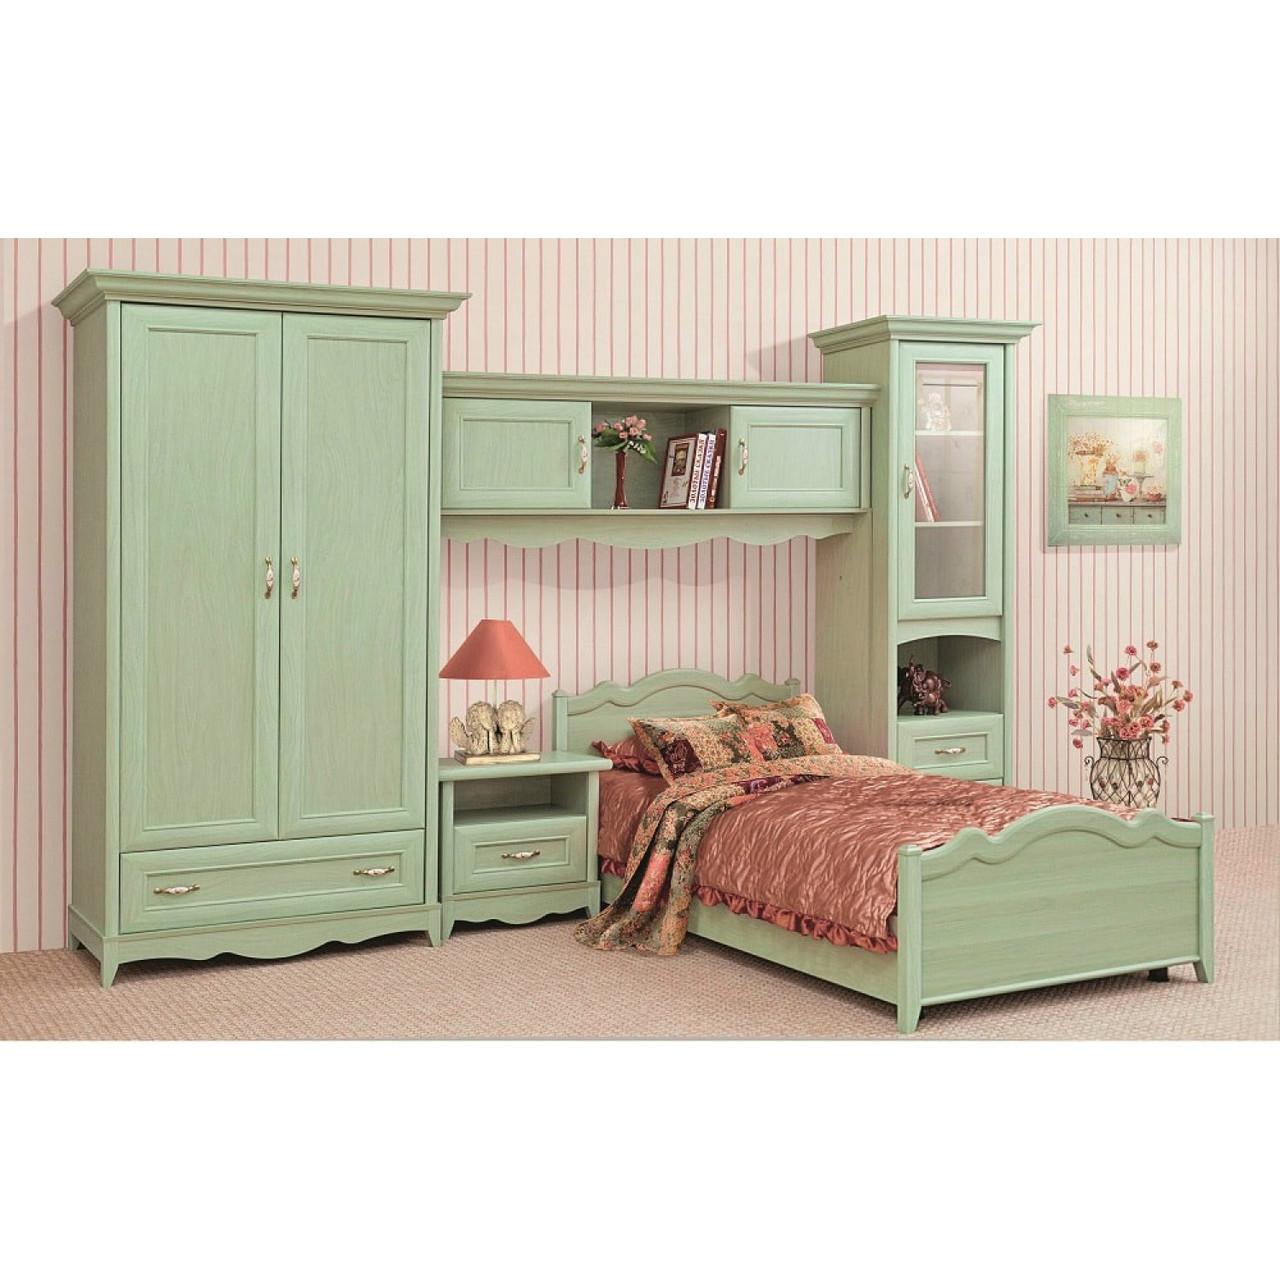 Селина детская спальня 3. (ольха зеленая) Світ меблів.